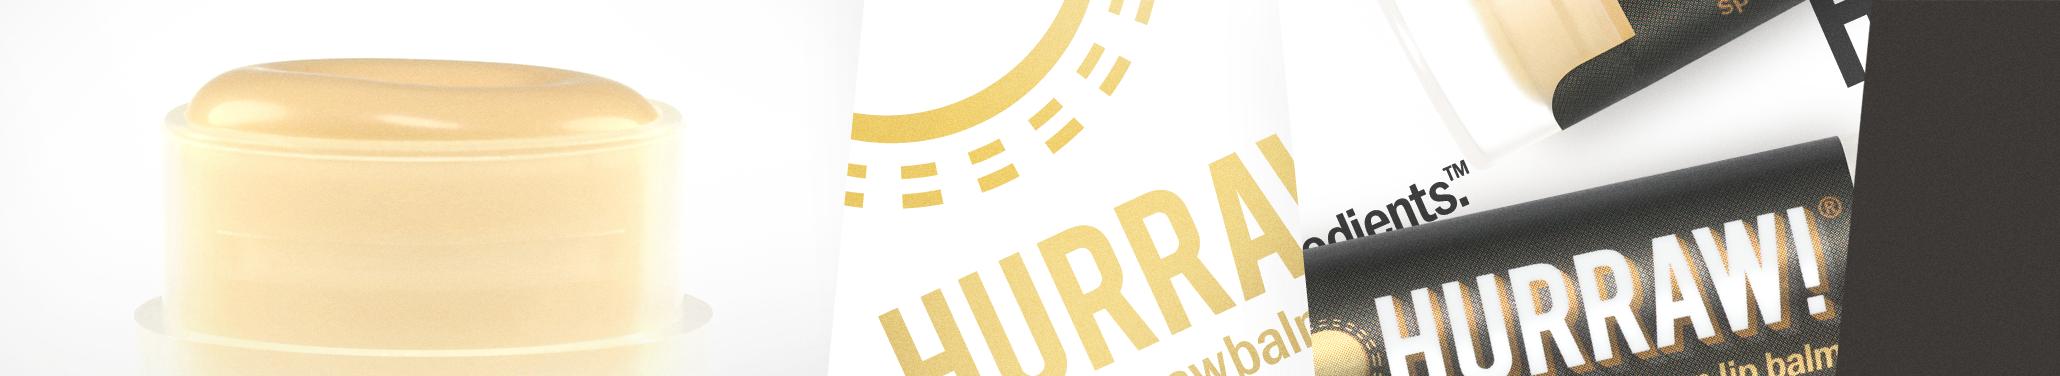 hurraw-slunecniochrana-horni